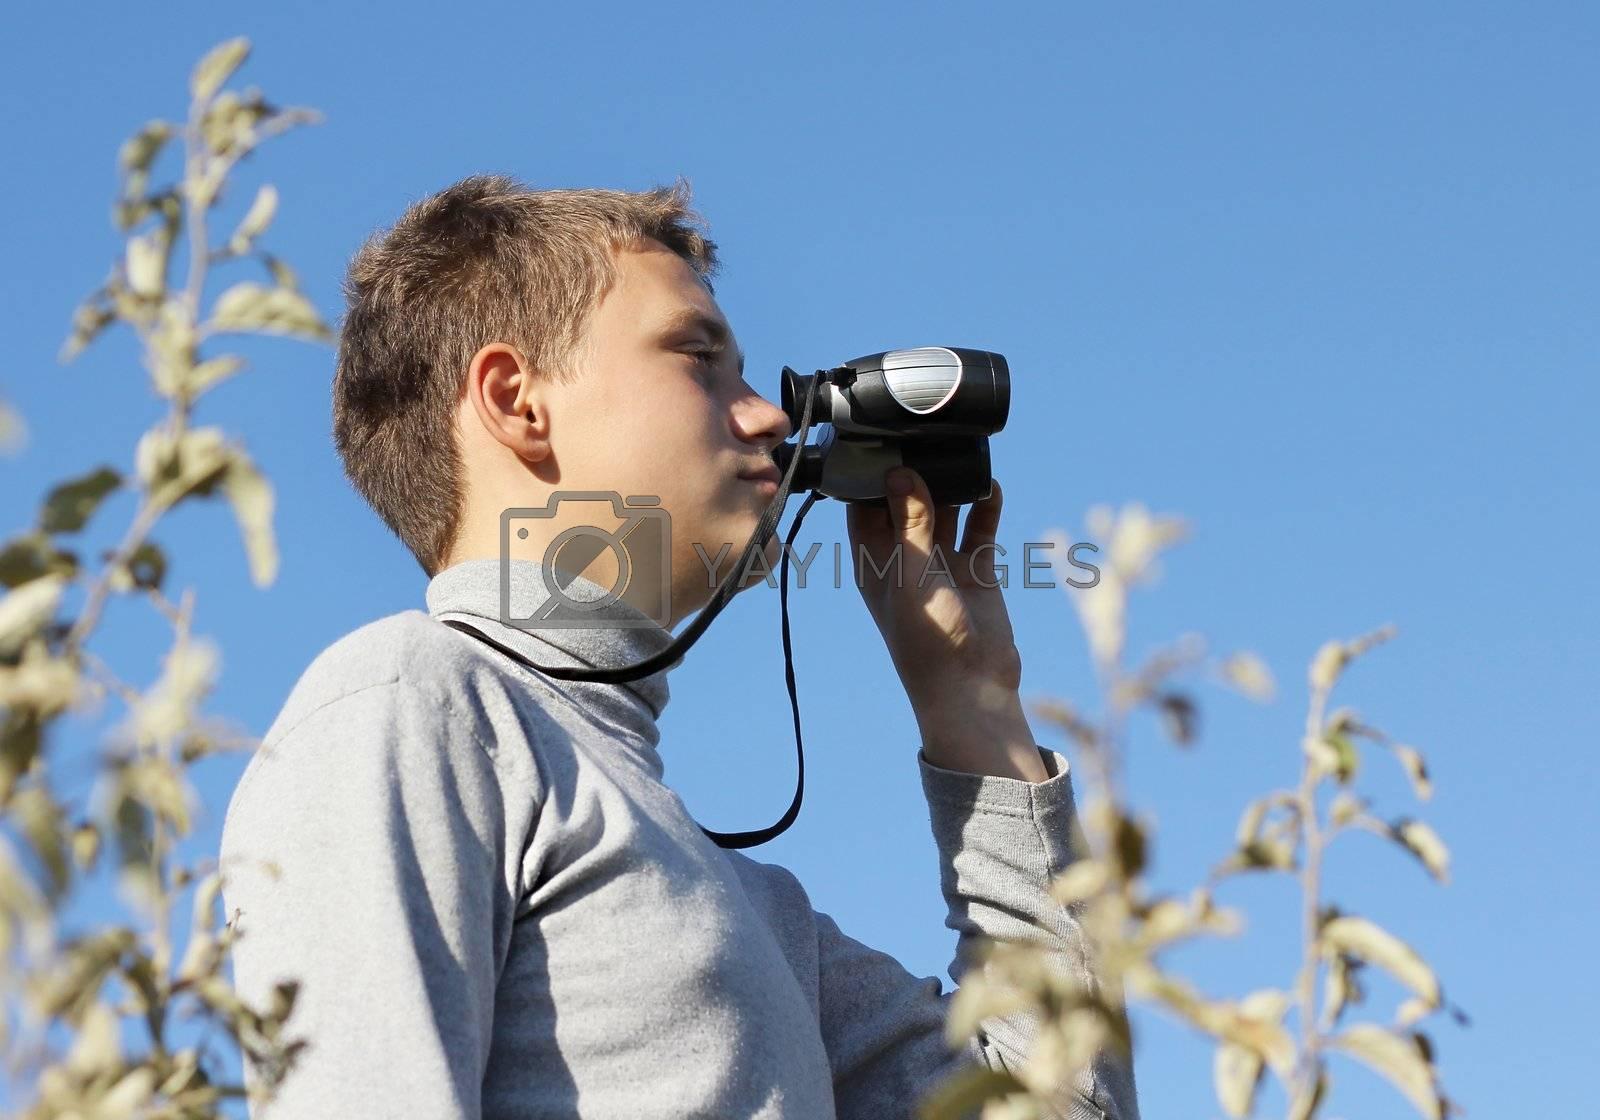 Boy with binoculars in hand in summer day